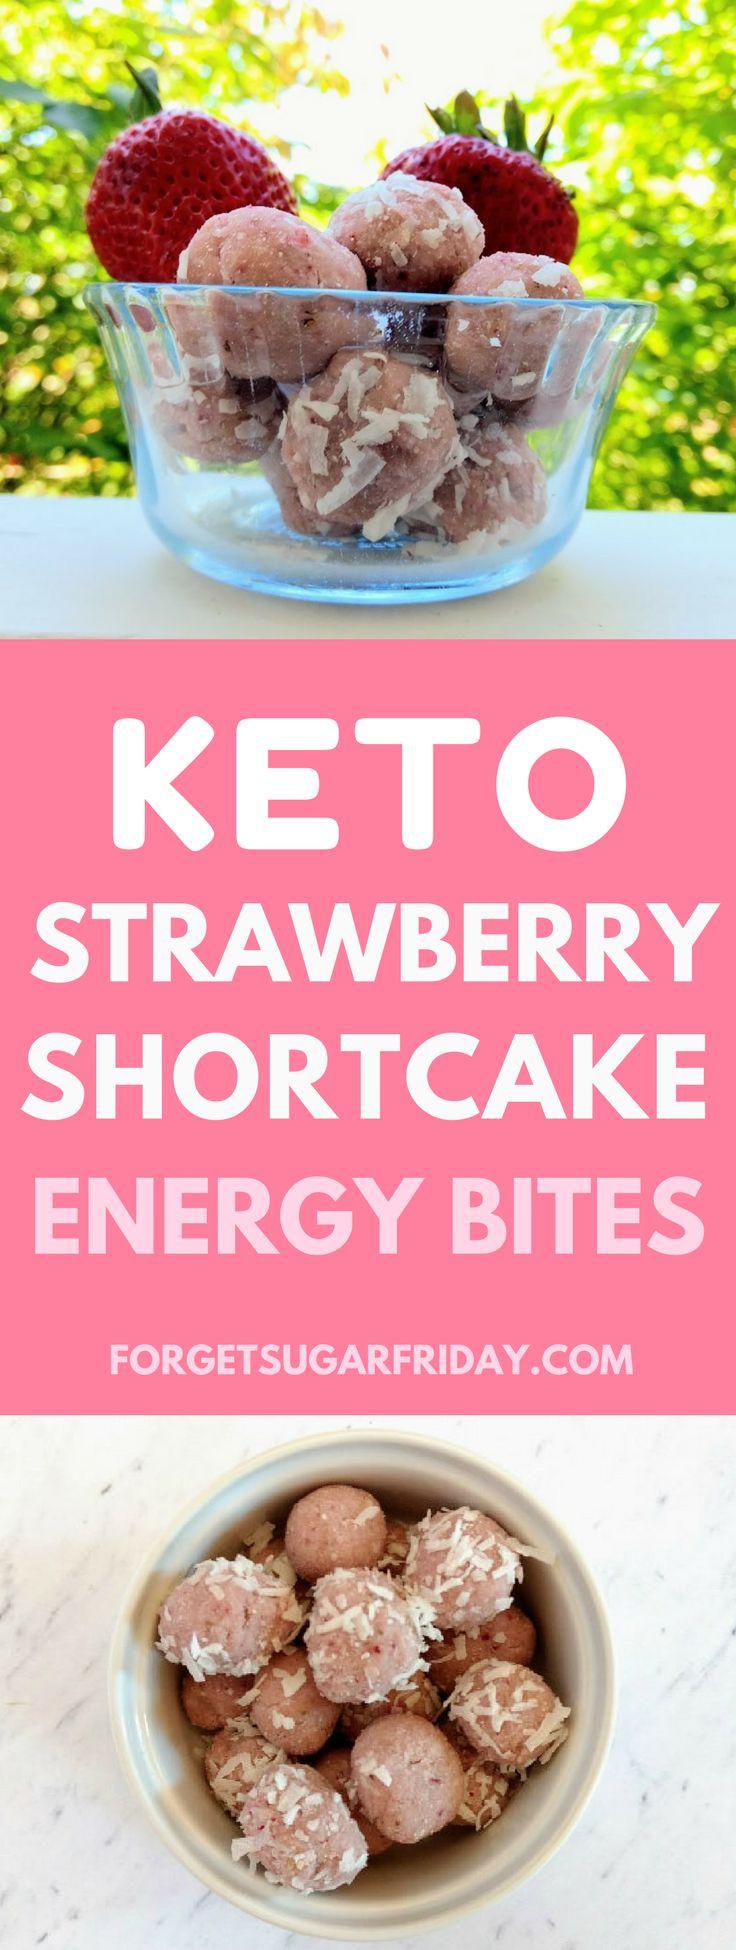 Keto Diet Strawberries  These Keto Strawberry Shortcake Energy Bites are an